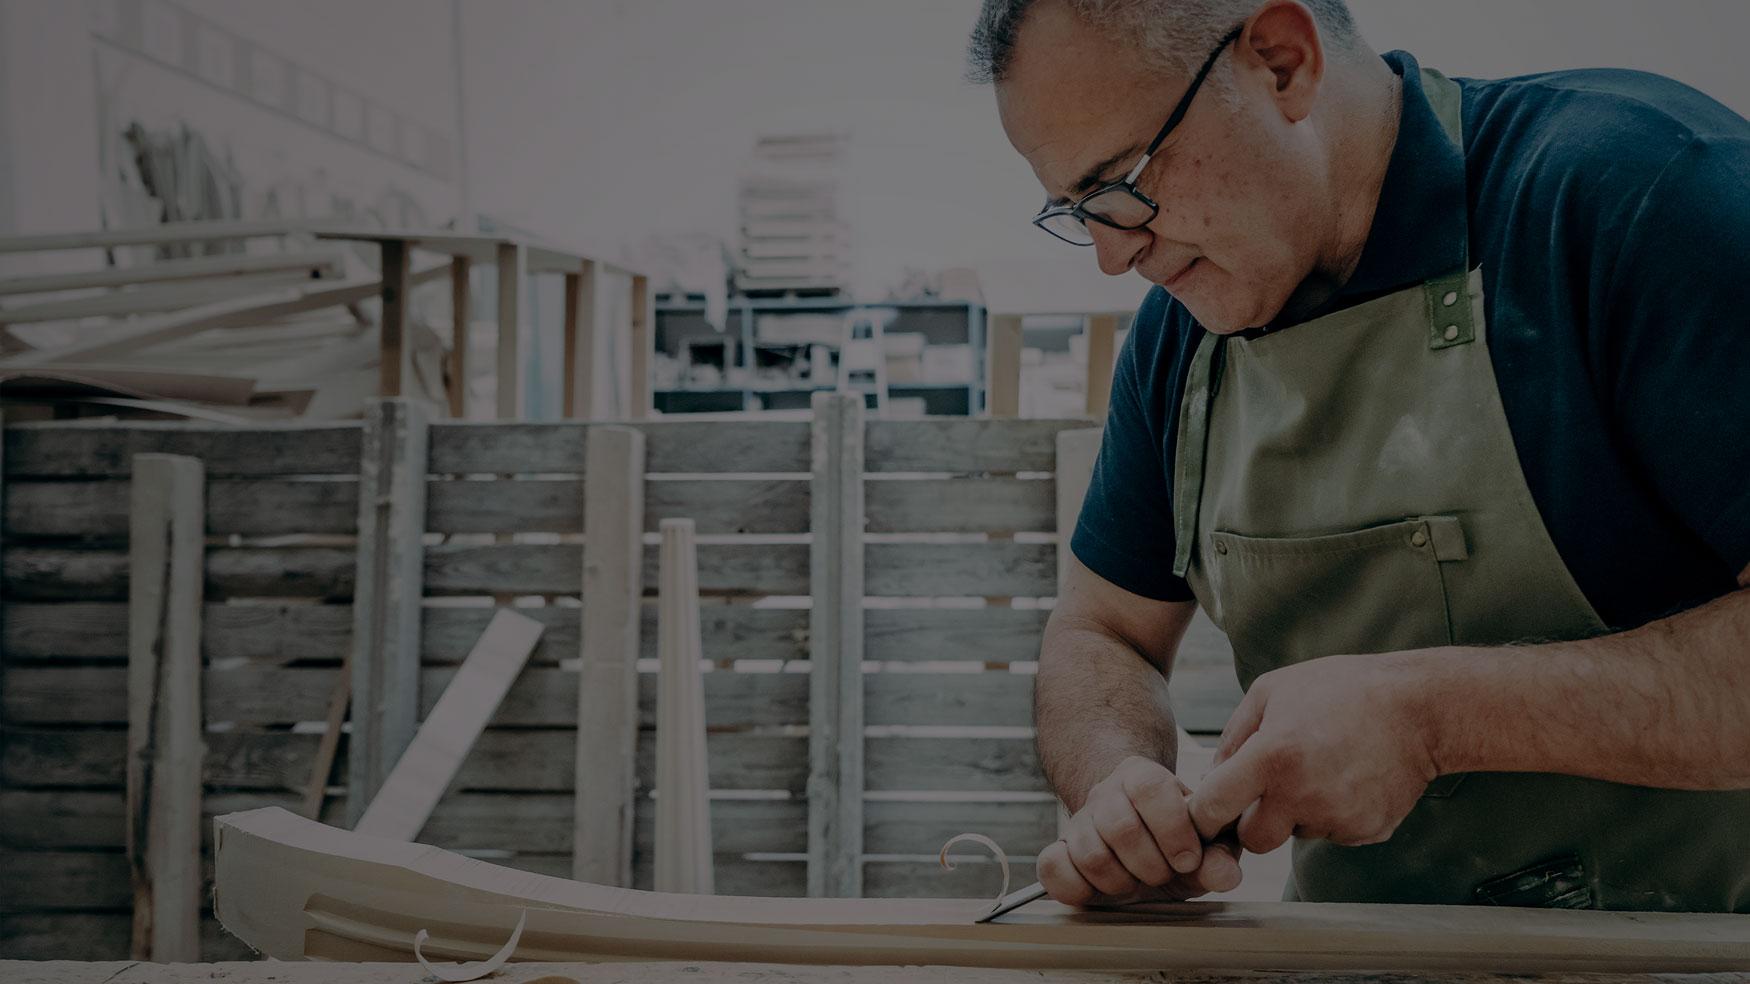 Verona craftsmanship